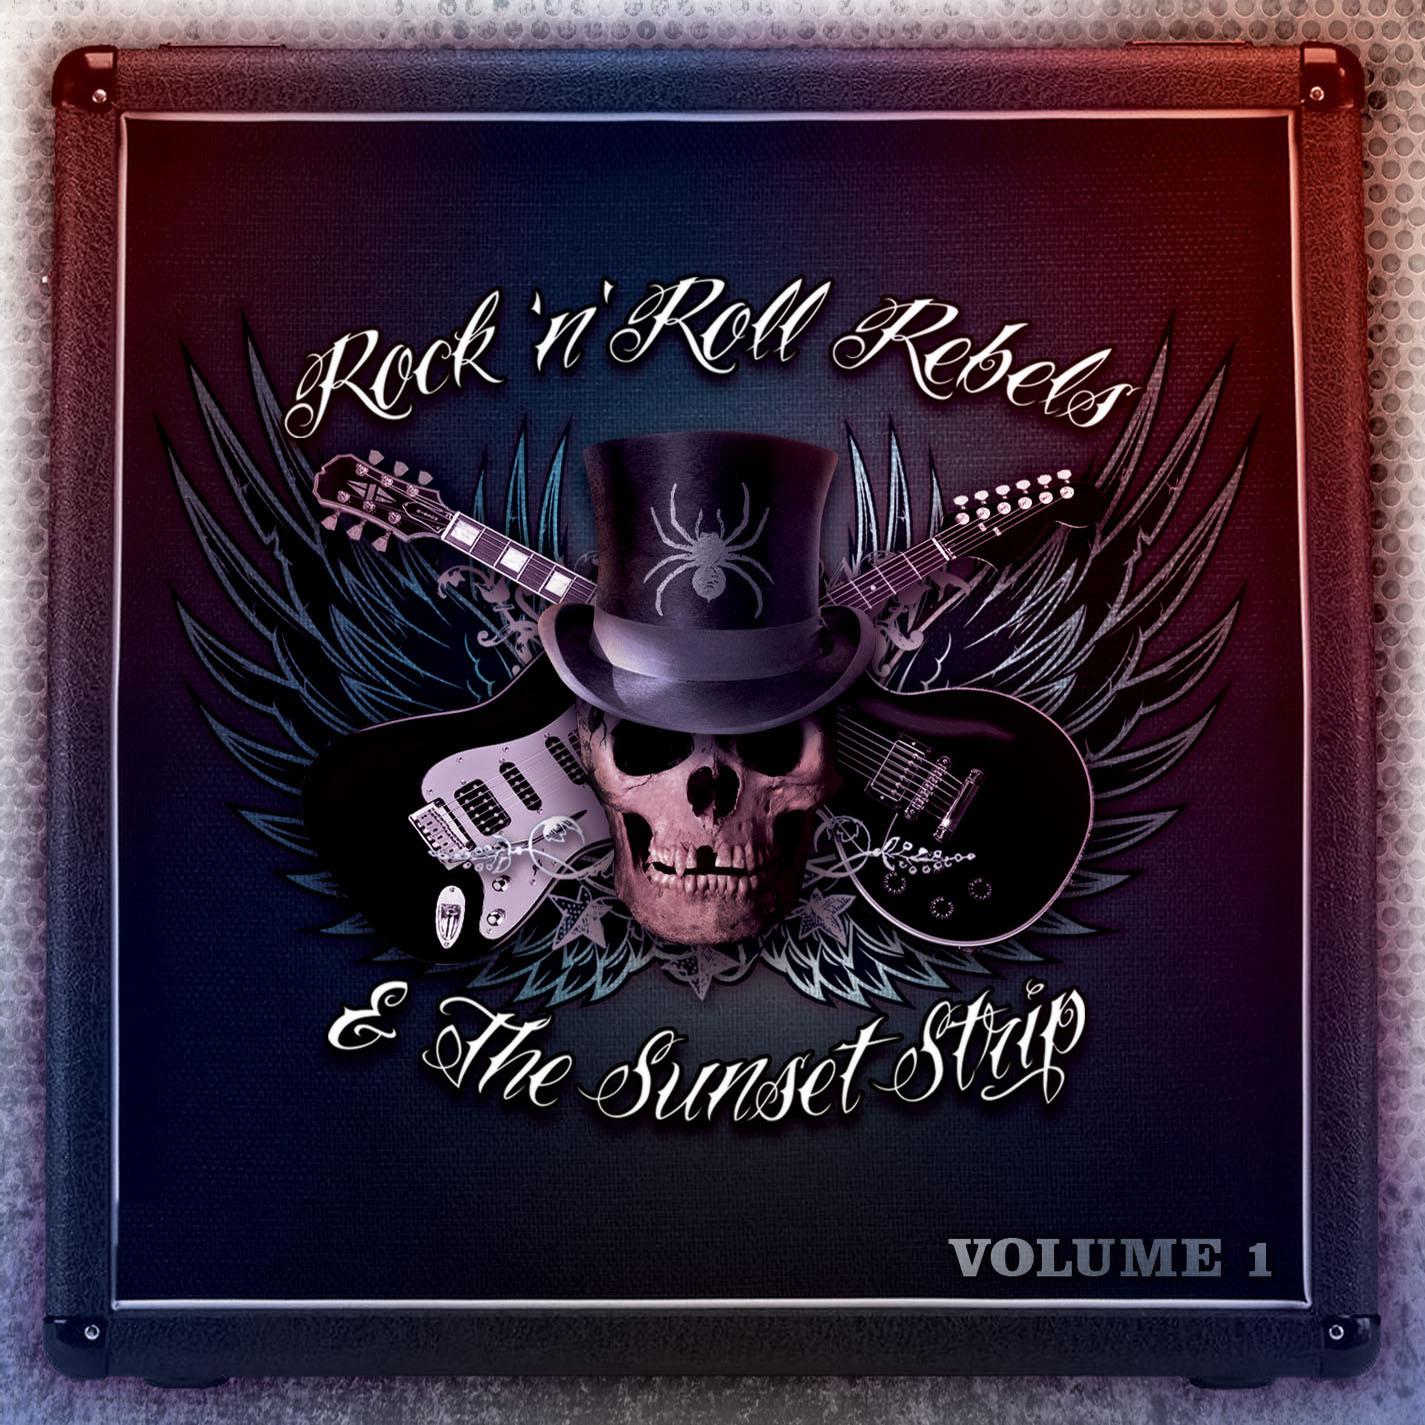 Rock 'n' Roll Rebels & the Sunset Strip Volume One